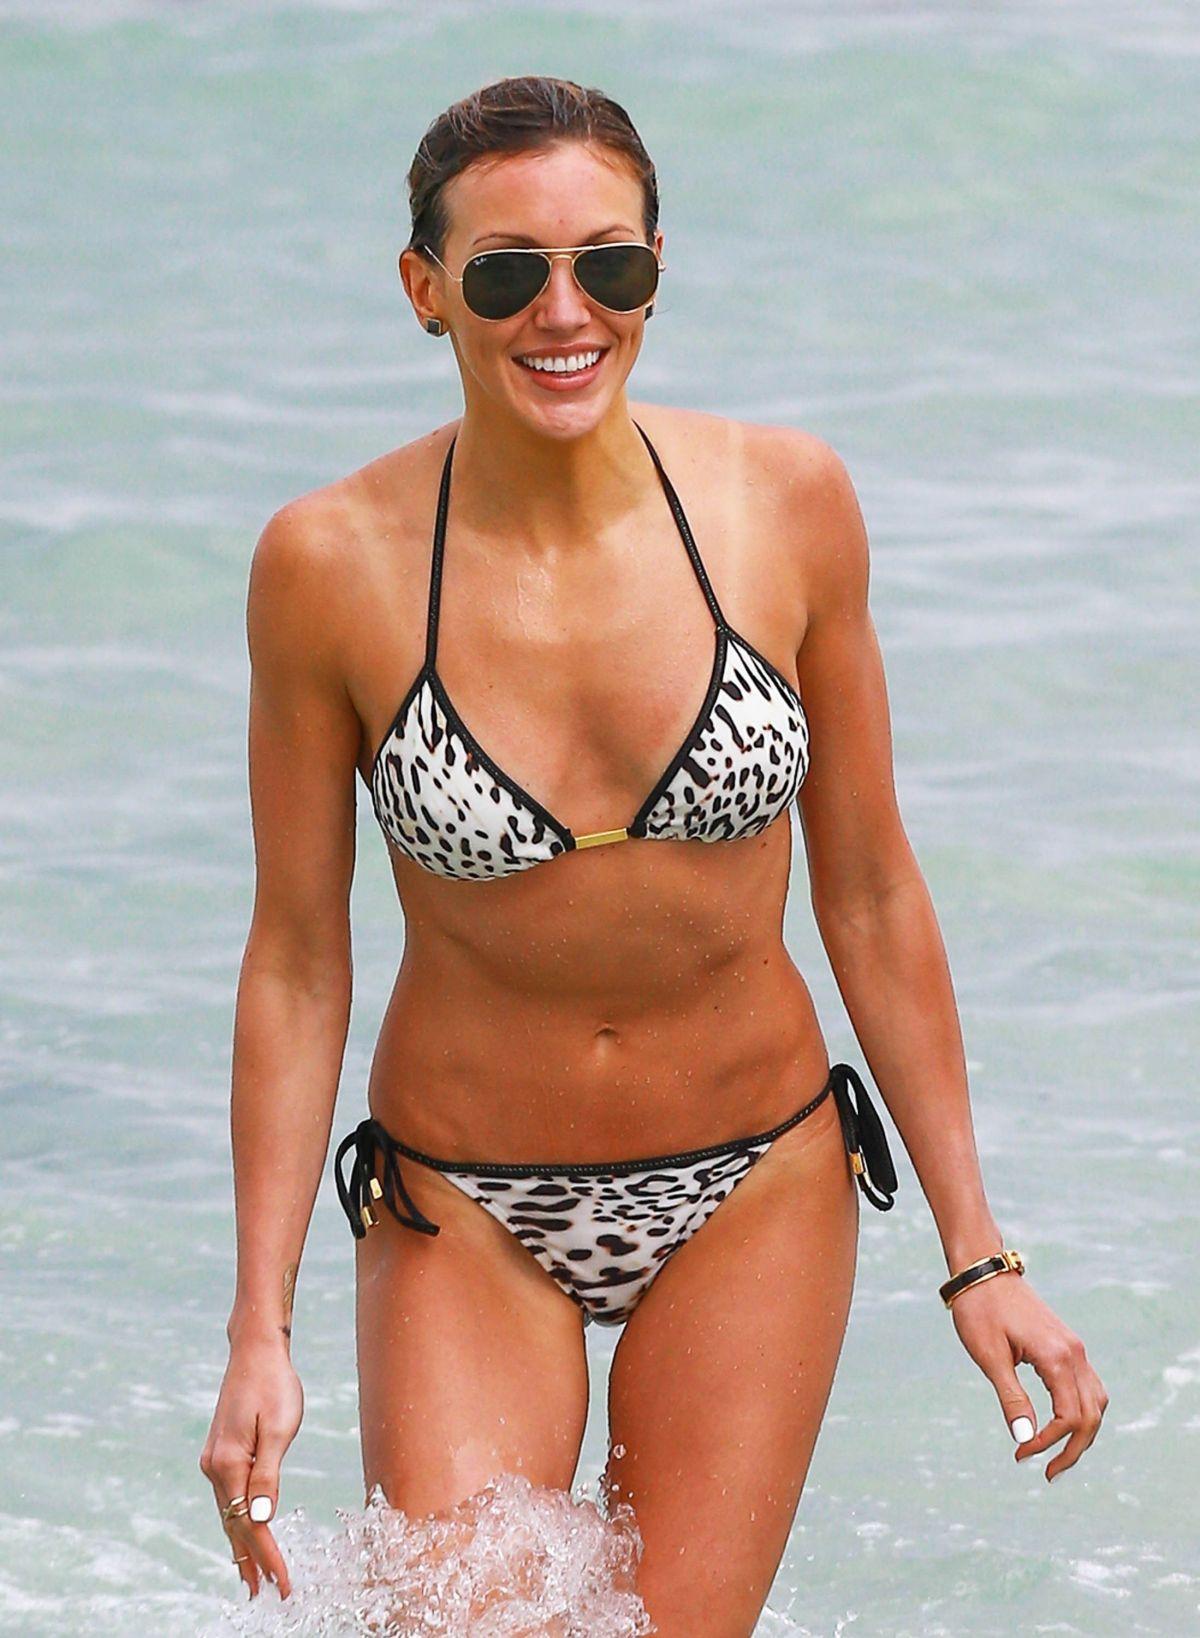 KATIE CASSIDY in Bikini at a Beach in Miami 04/22/2015 – HawtCelebs